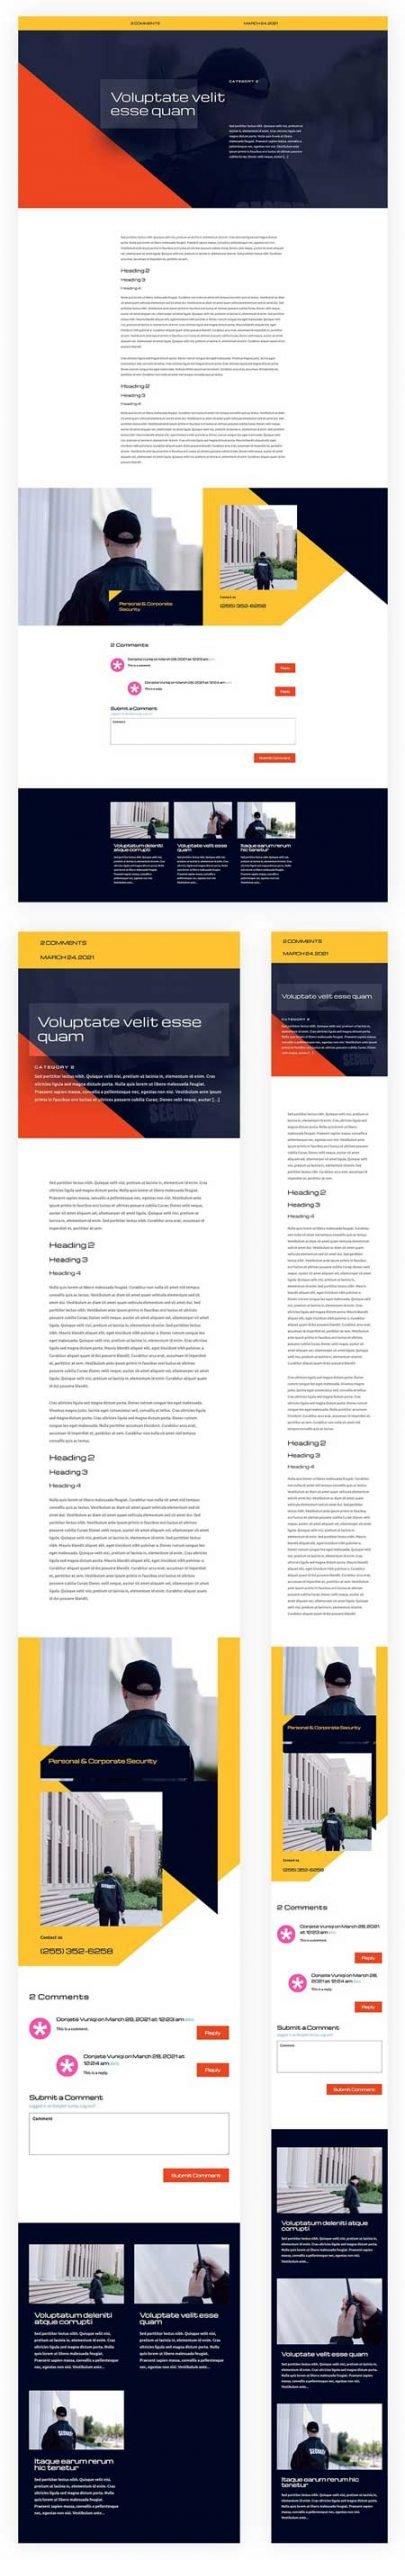 Divi Security Services Blog Post Template